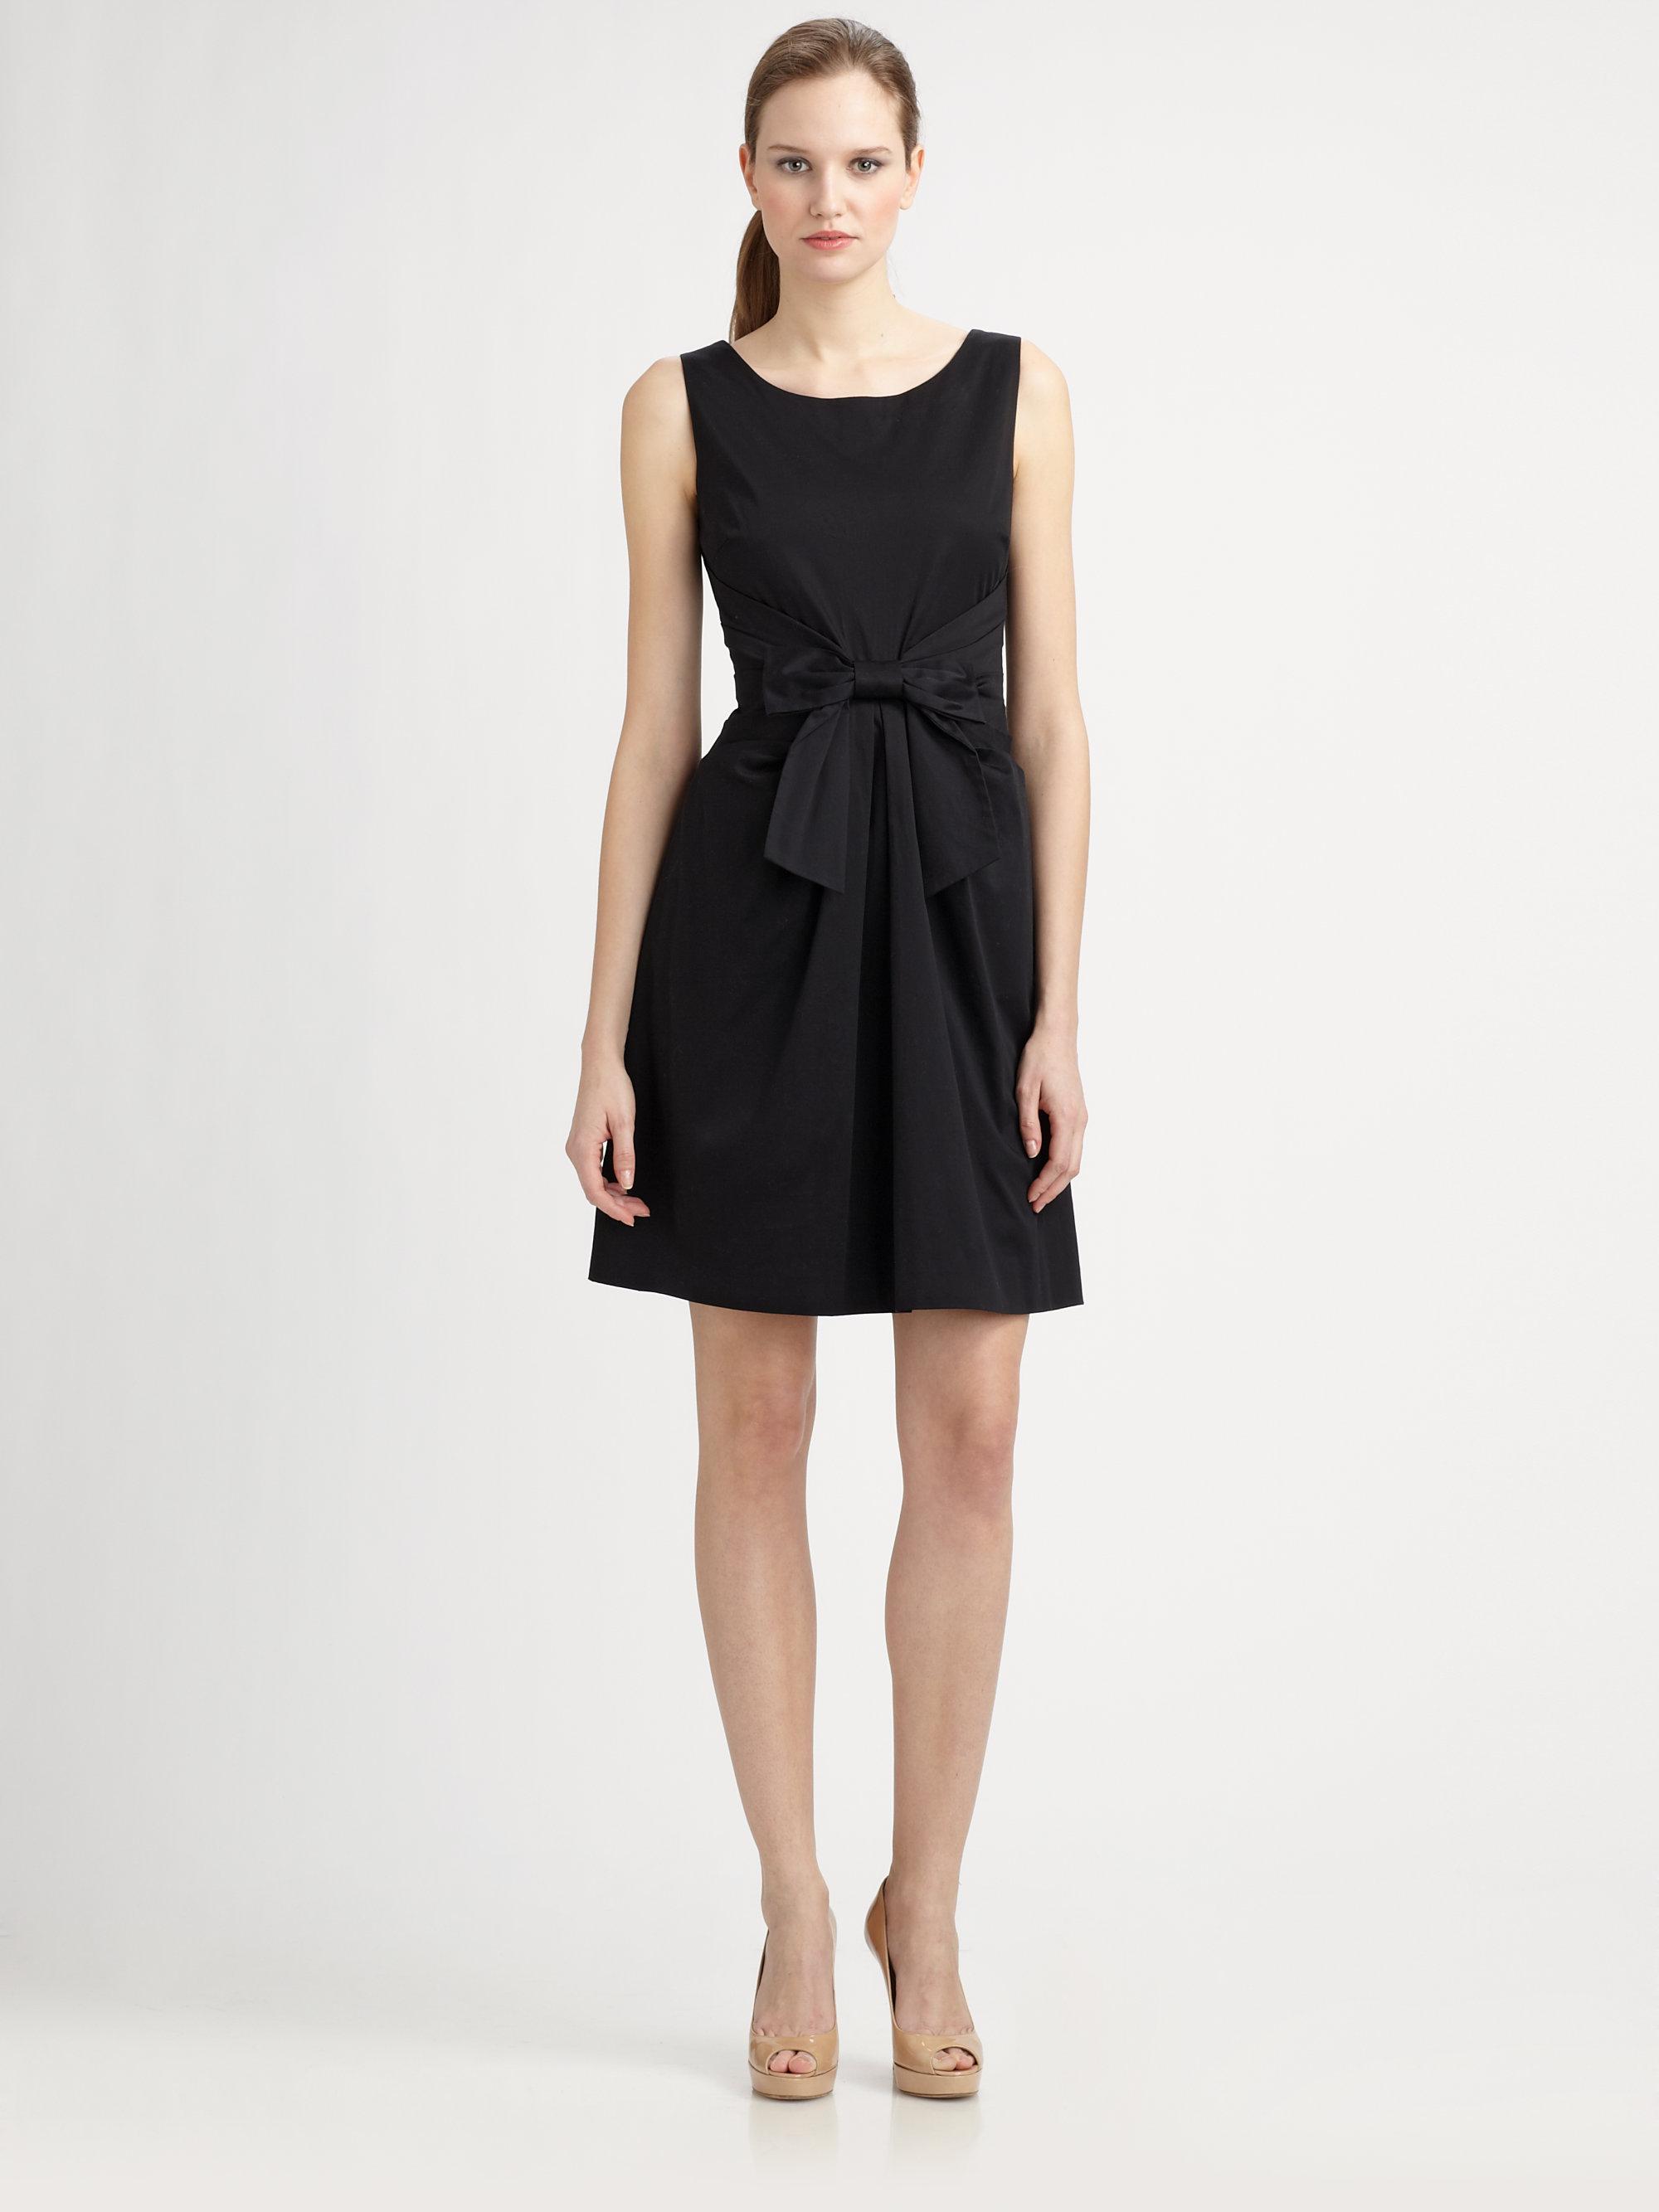 8a2b69d9a Kate Spade Jillian Bow Dress in Black - Lyst